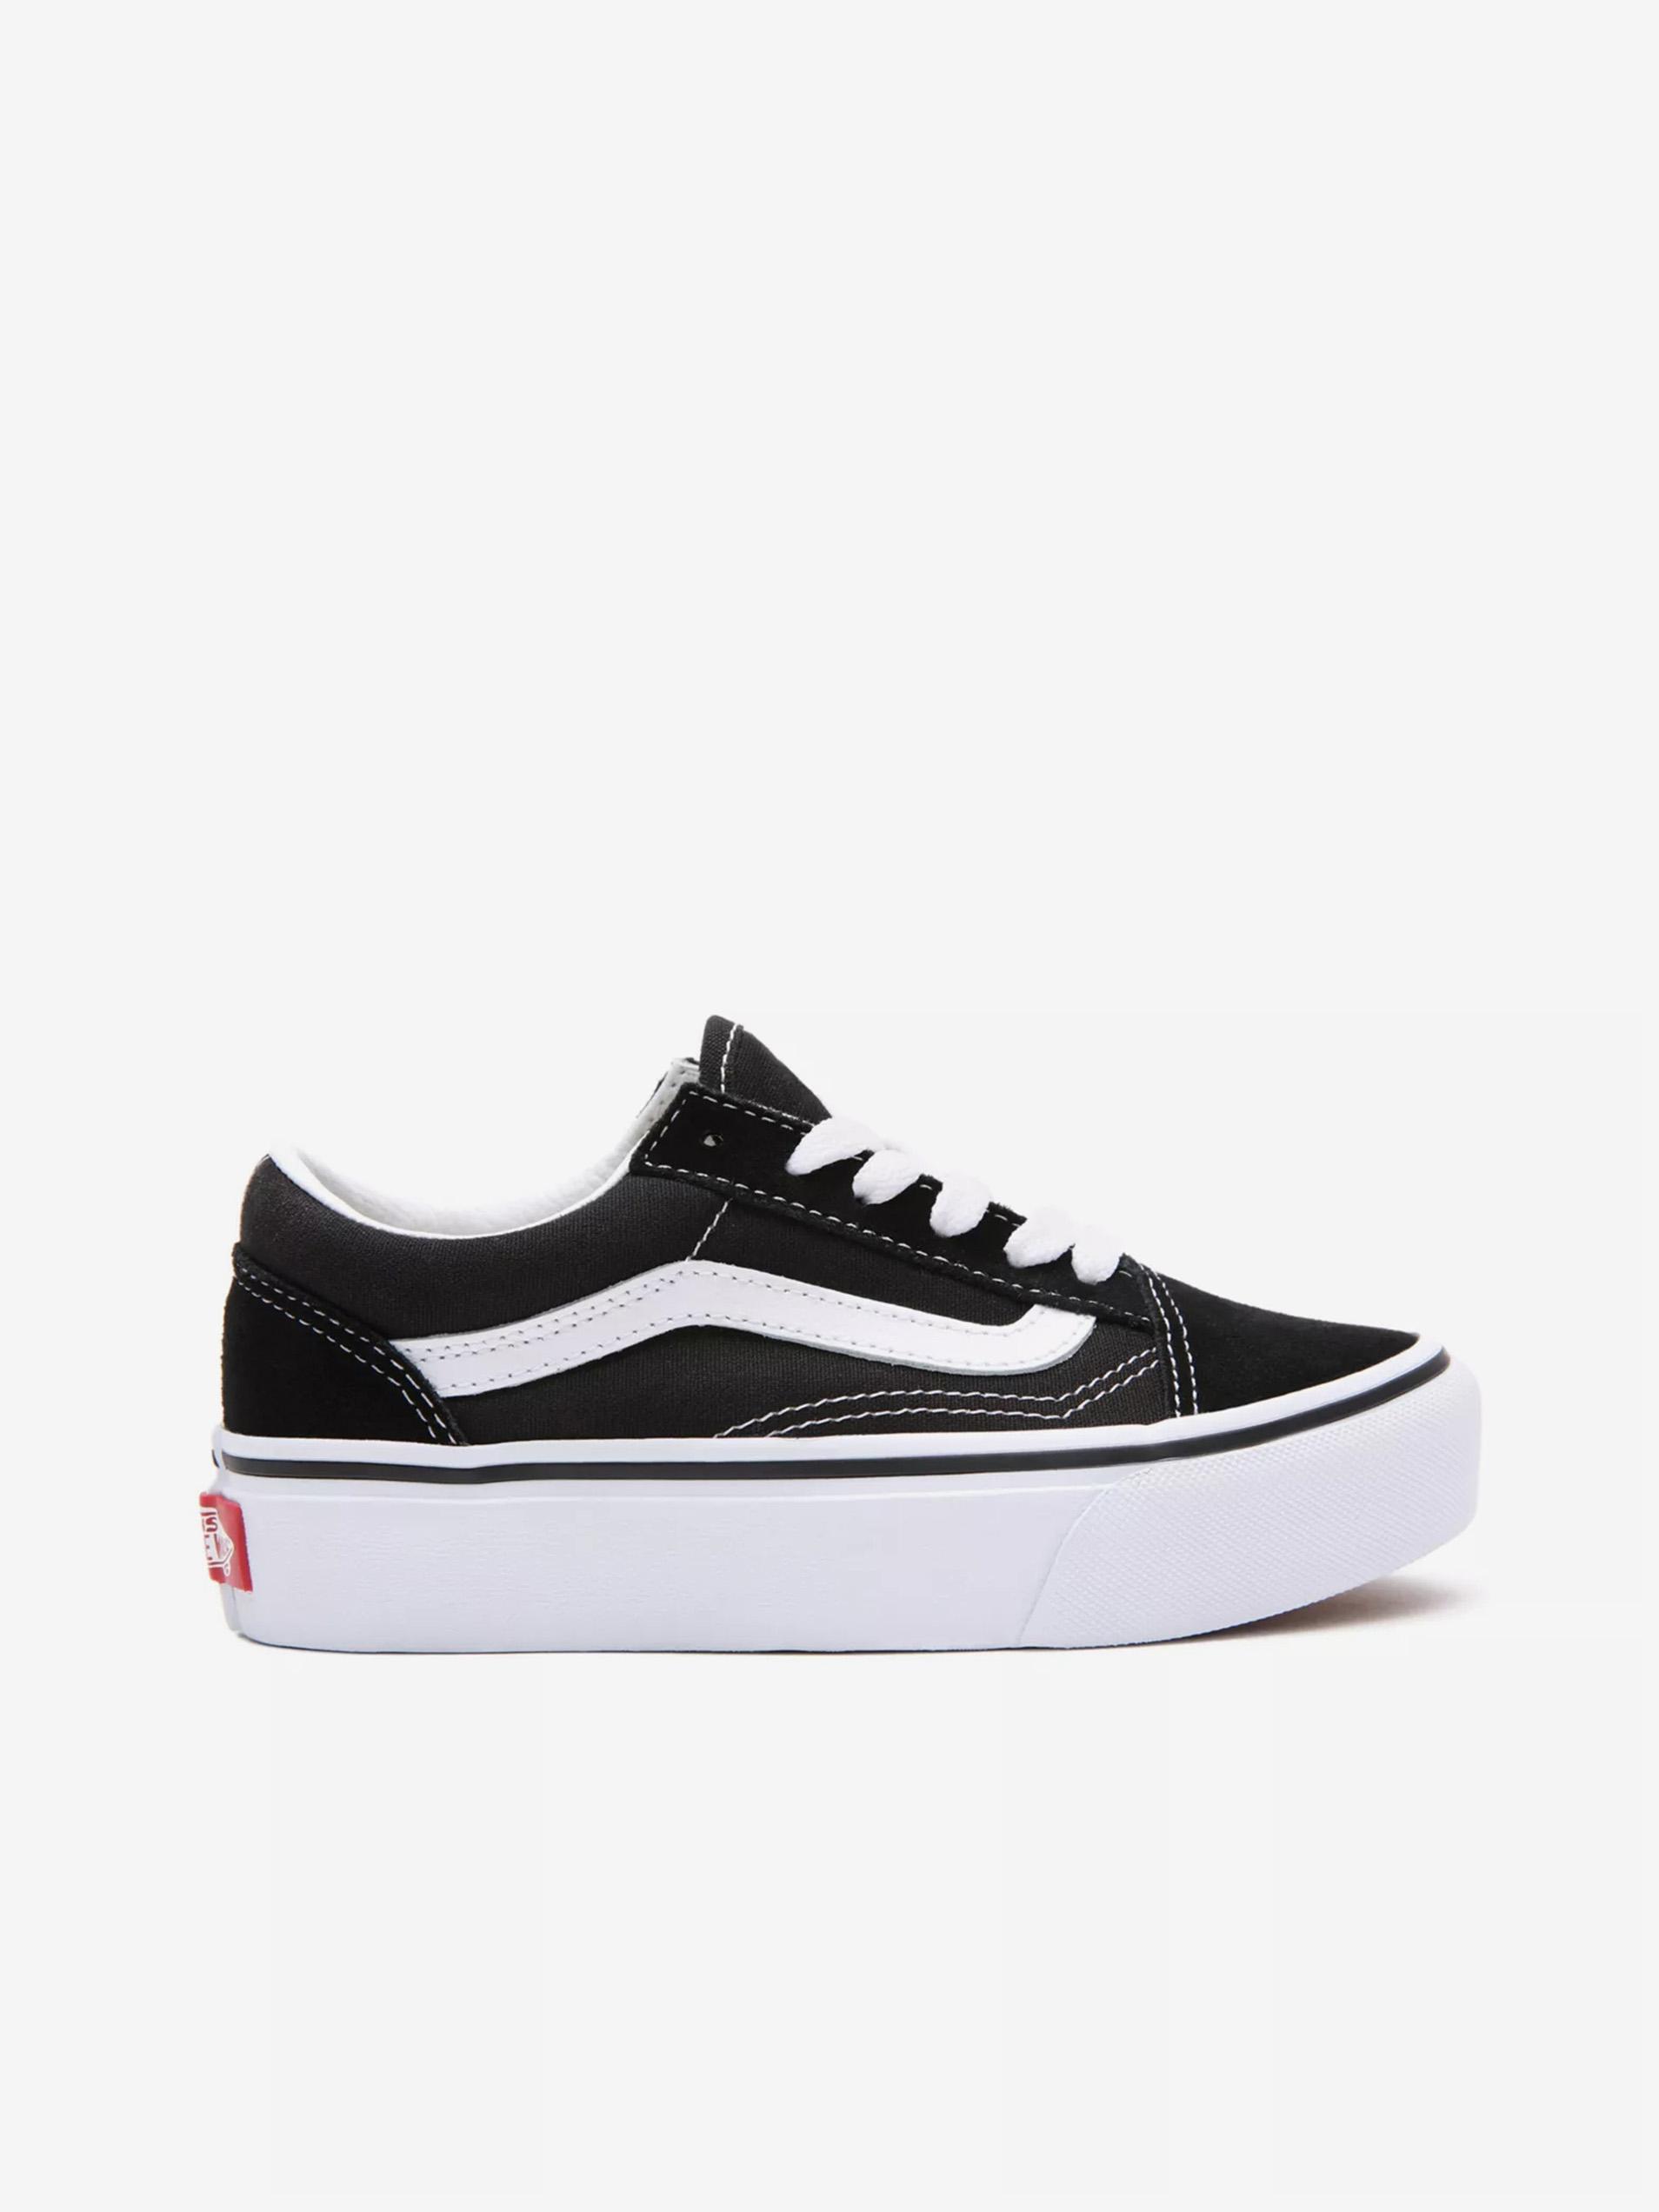 Bielo-čierne chlapčenské semišové topánky VANS Old Skool Platfor - 31